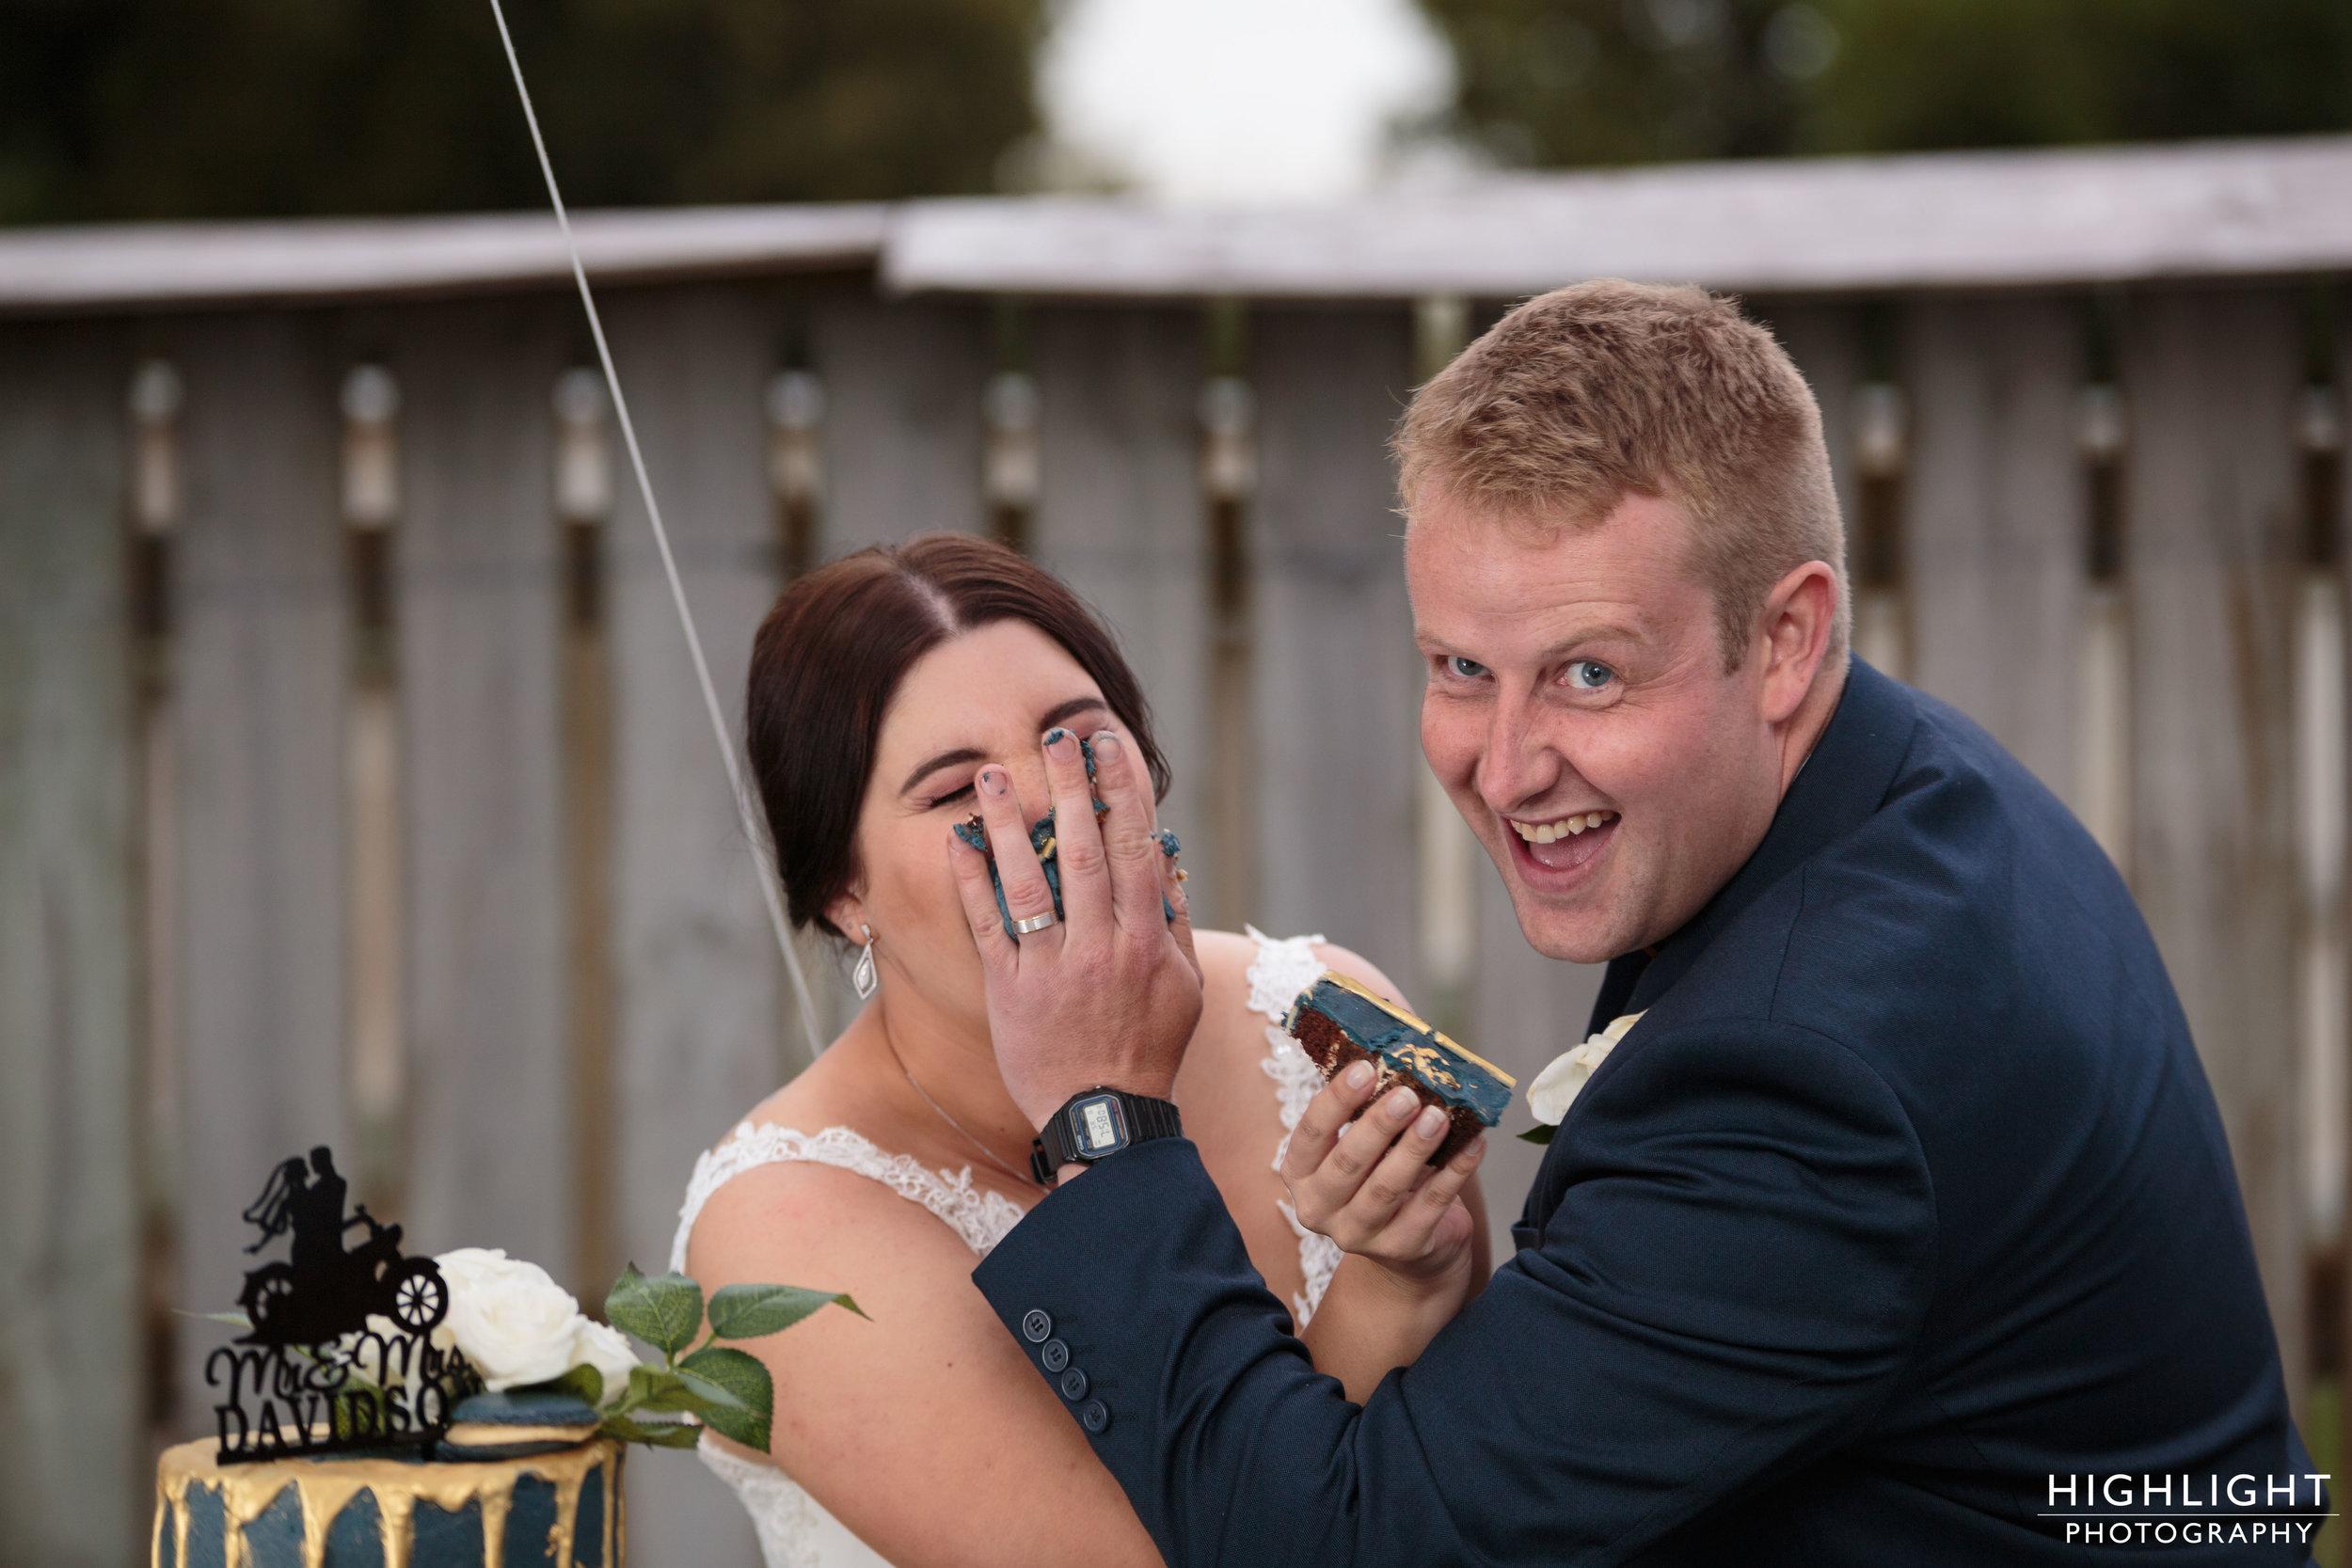 JM-2017-Highlight-wedding-photography-palmerston-north-new-zealand-211.jpg